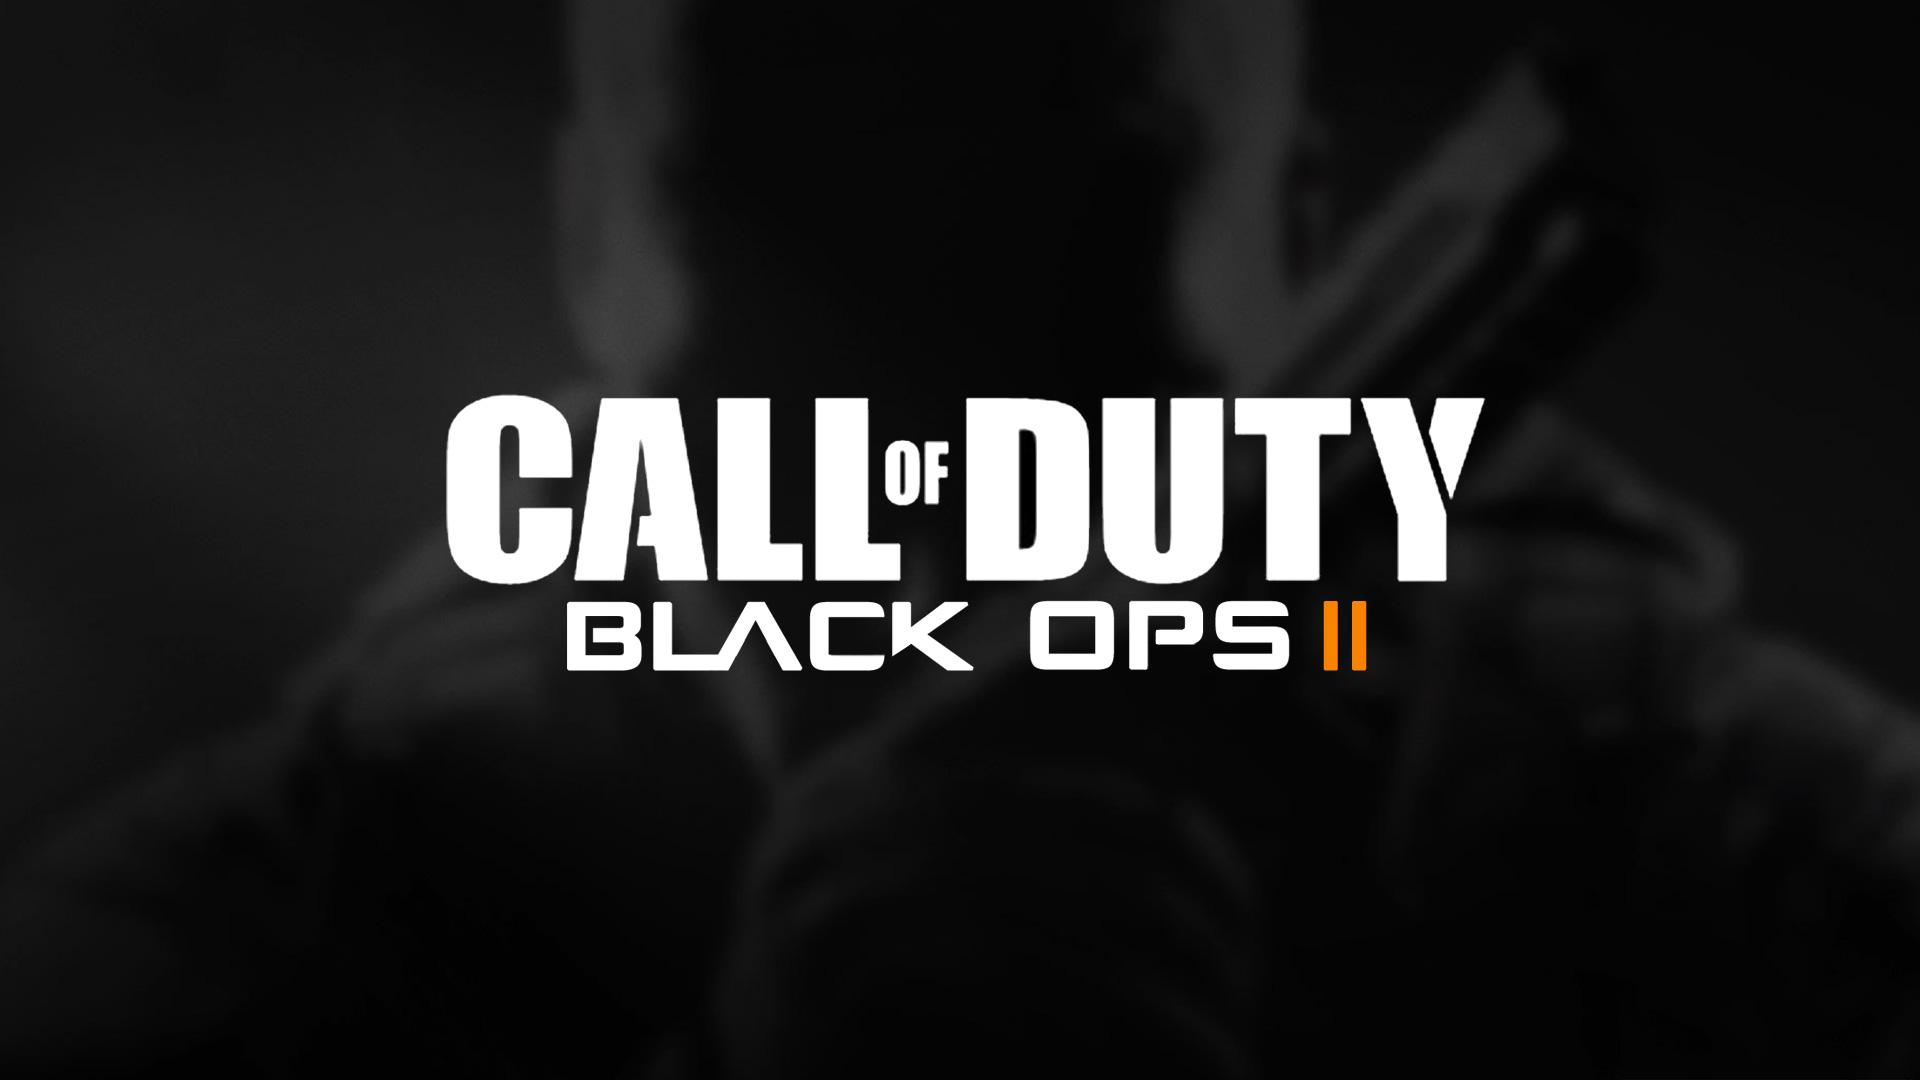 Call Of Duty Black Ops 2 Wallpaper 17 Wallpapersbq